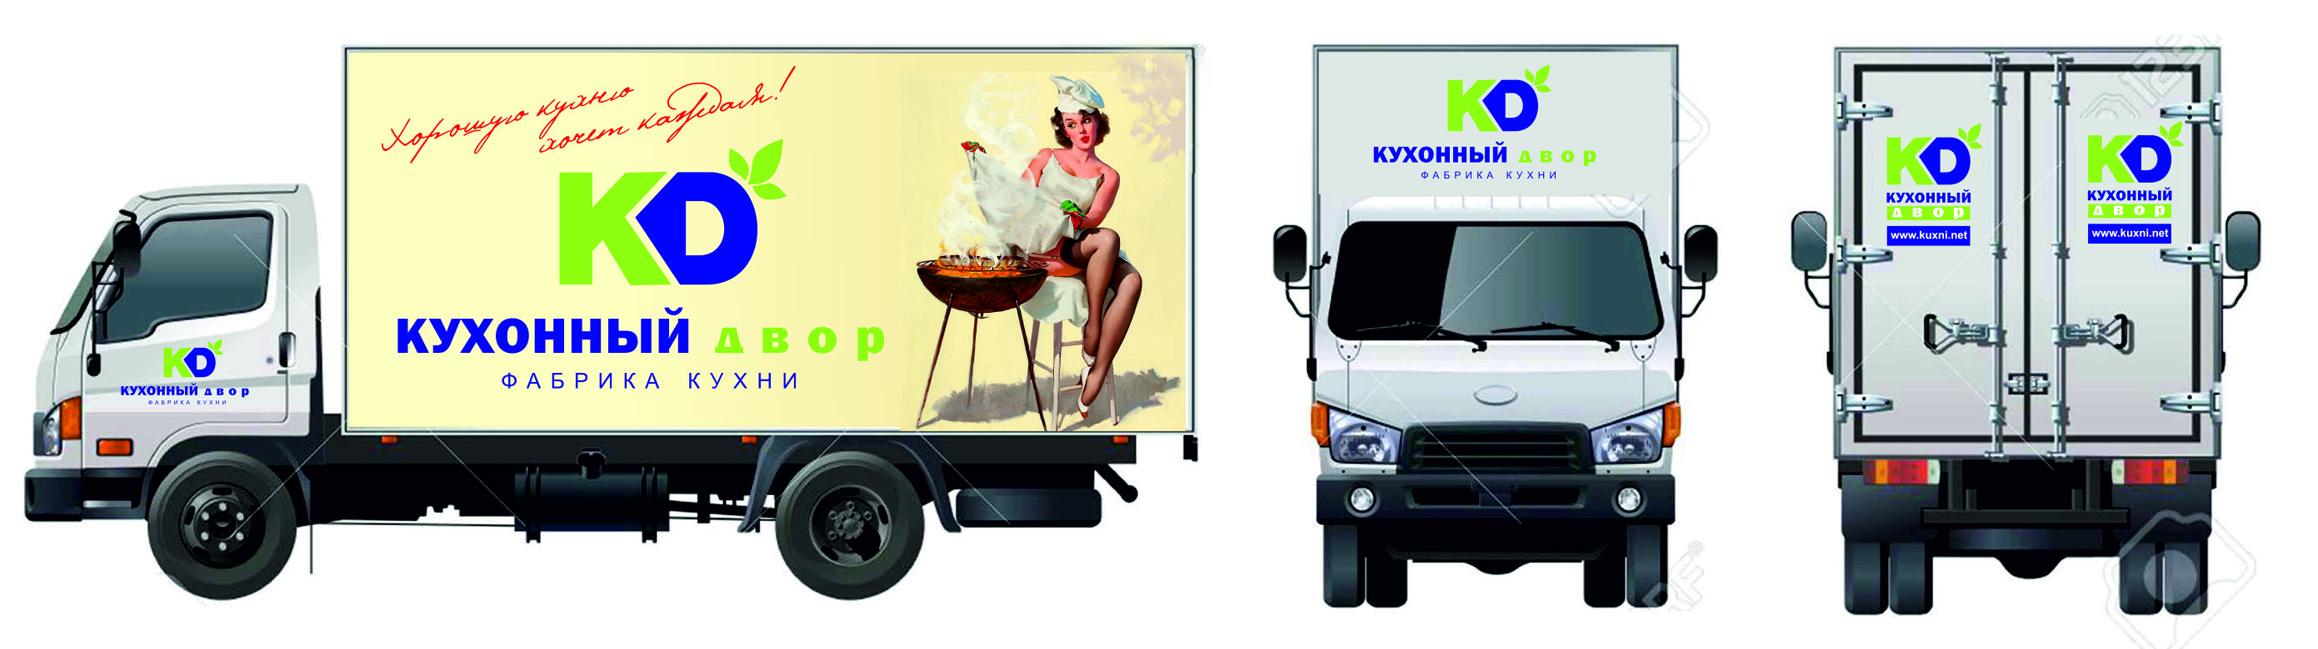 "Брендирование грузового авто для компании ""Кухонный двор"" фото f_44559c129ea4b3b4.jpg"